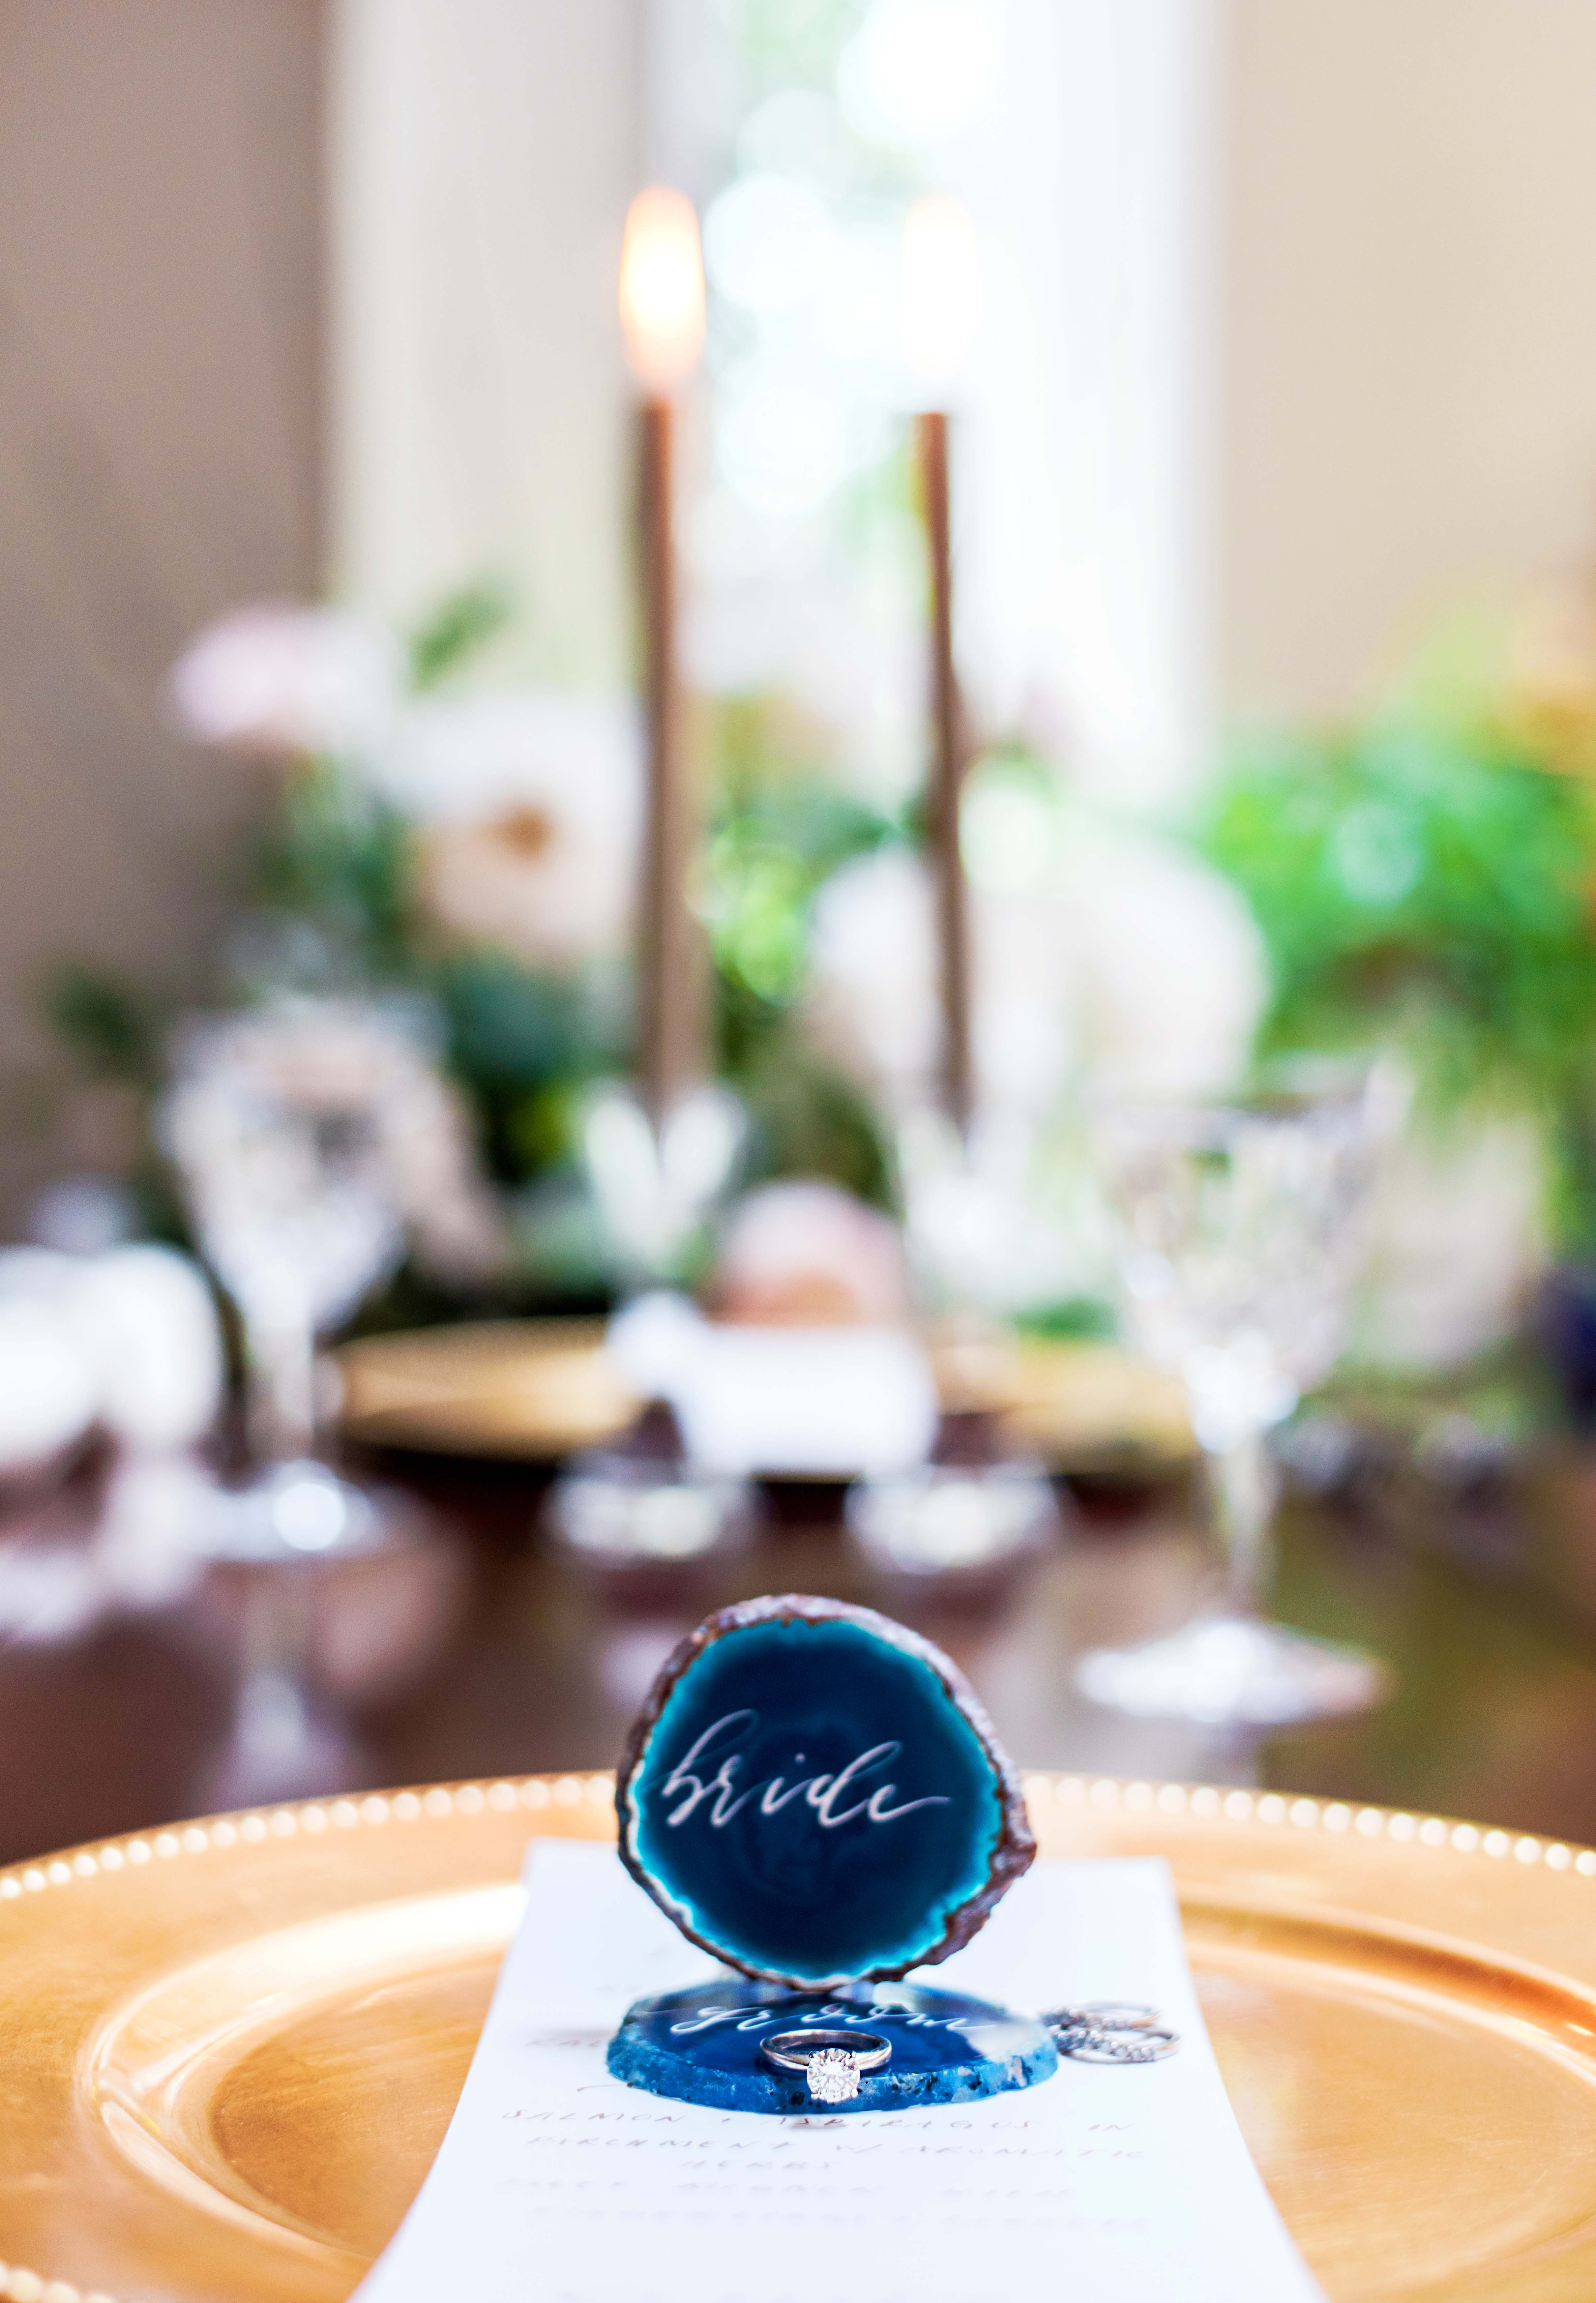 Wedding-Photography-The-Foundry-Pheonixville-Pennsylvania-Andrea-Krout-Luxury-Portrait-6 copy copy